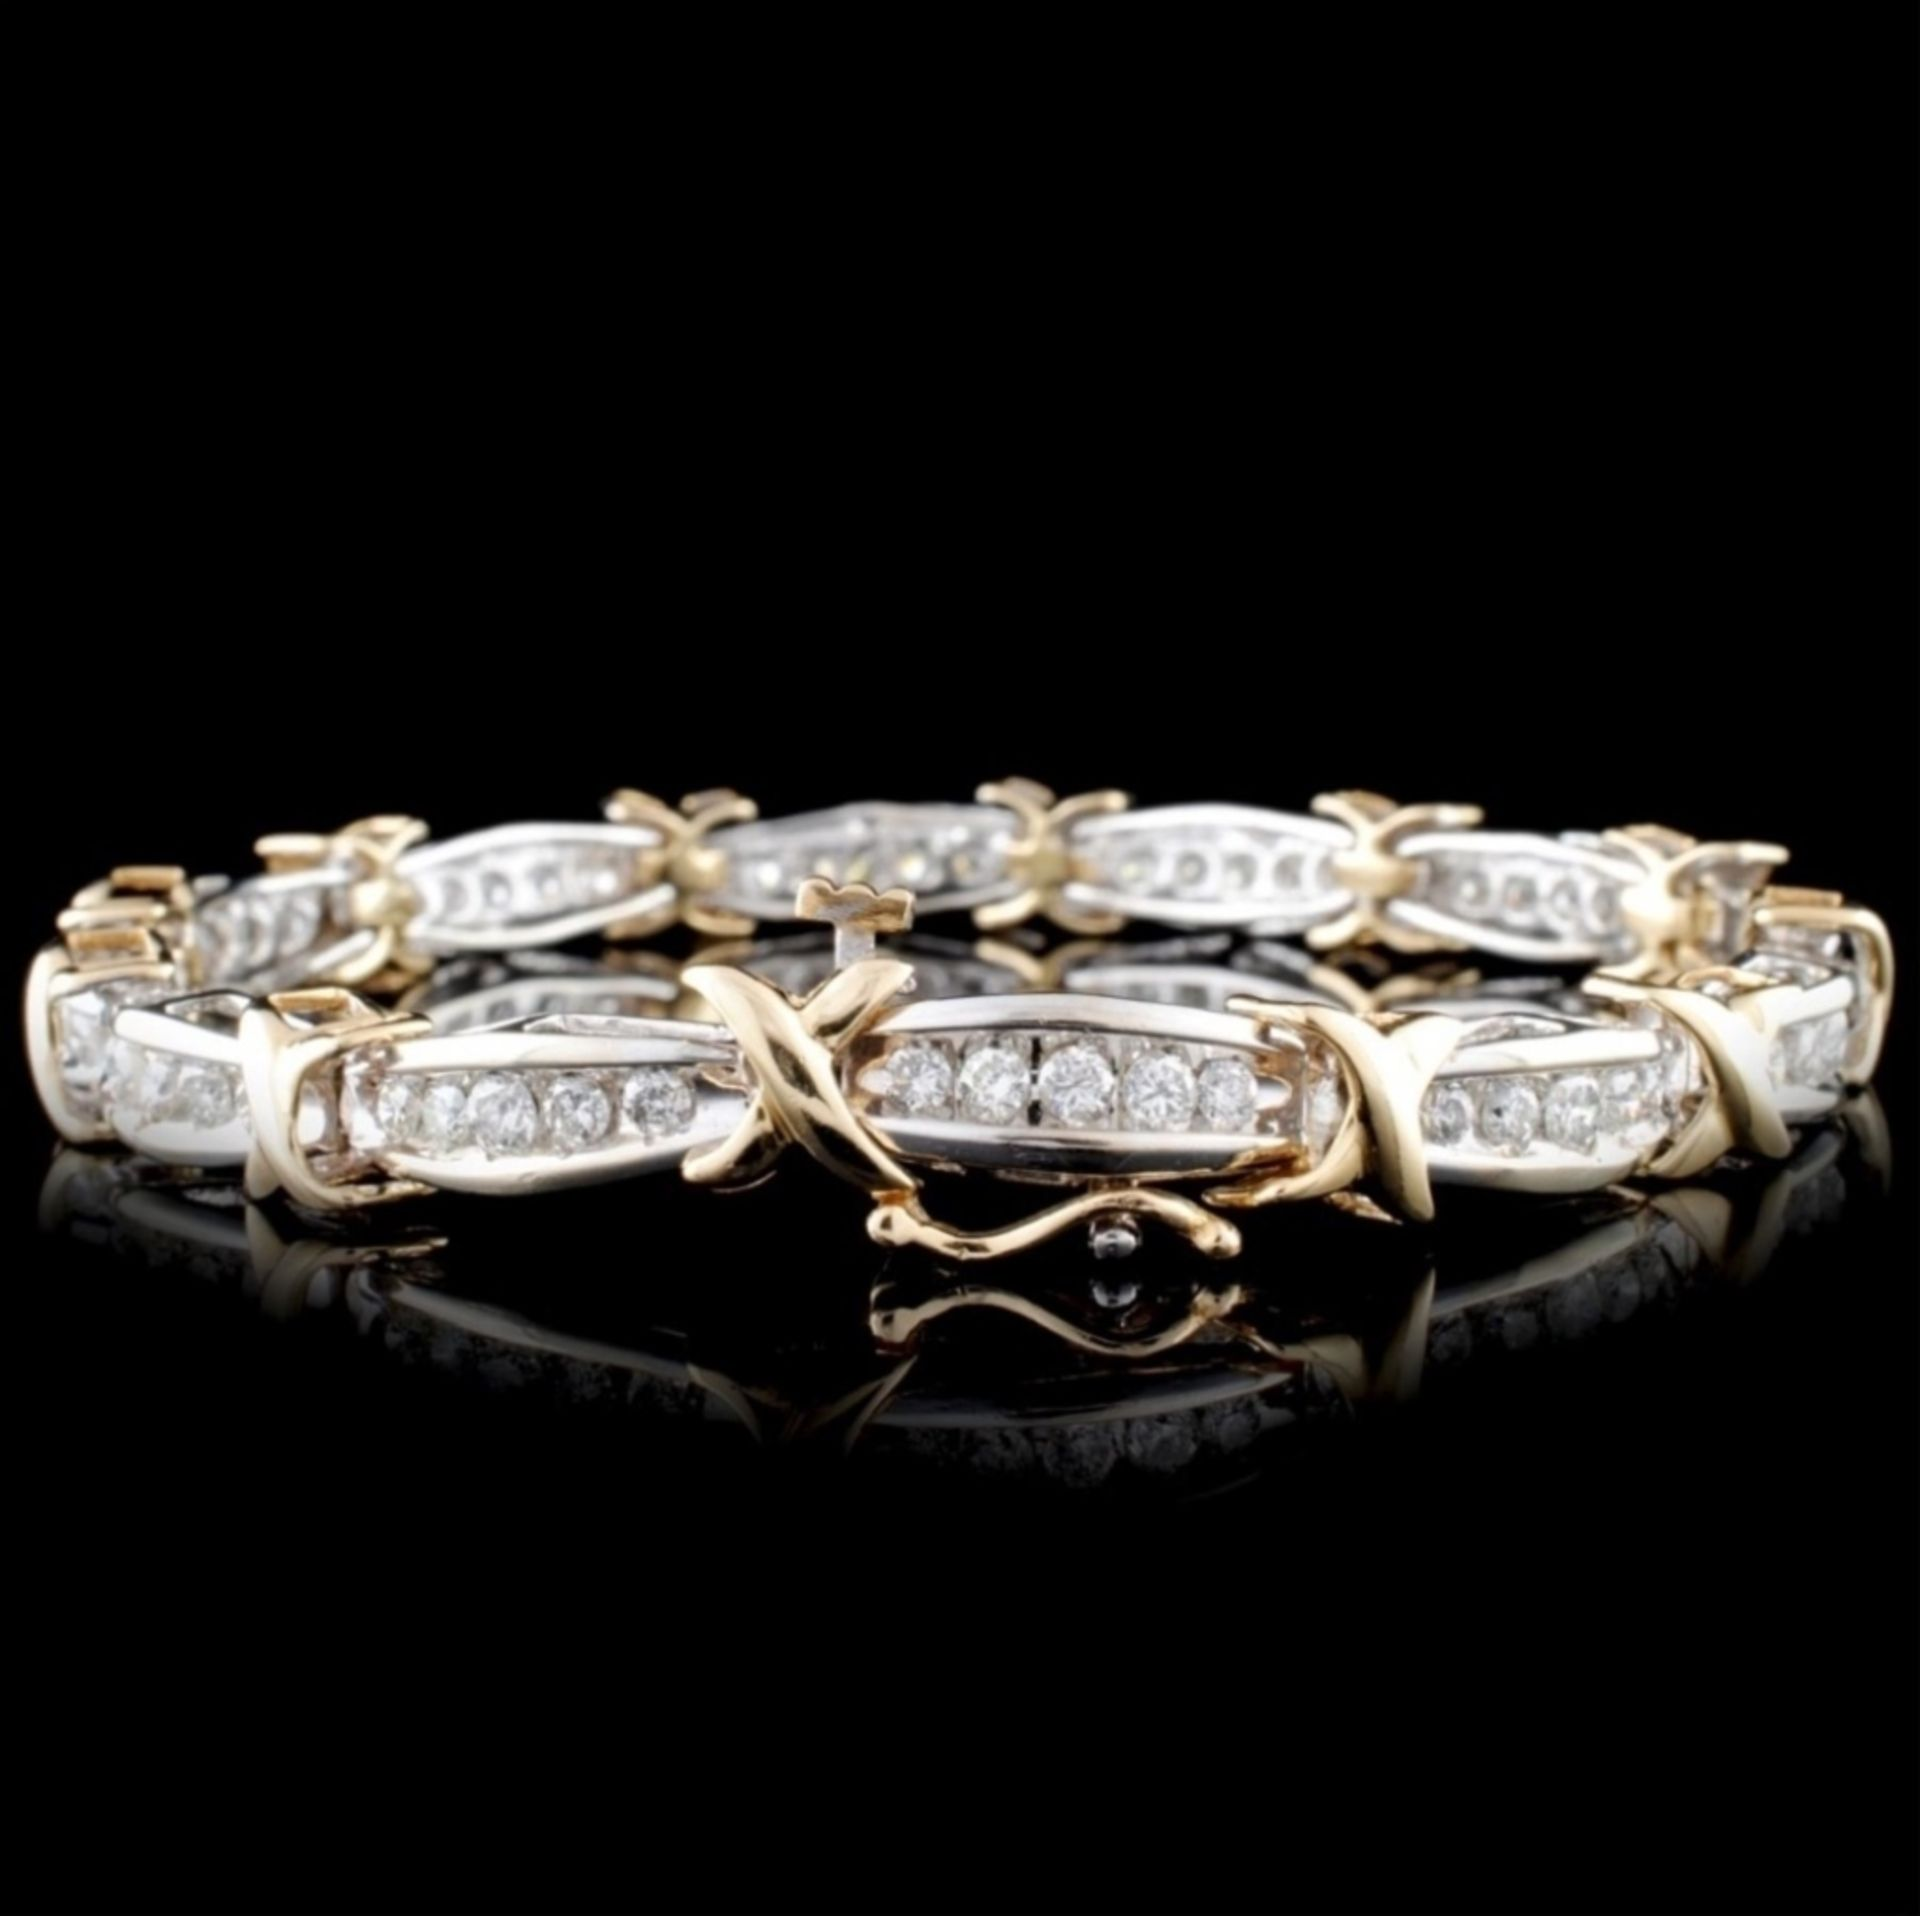 14K Two-Tone 2.68ctw Diamond Bracelet - Image 2 of 3